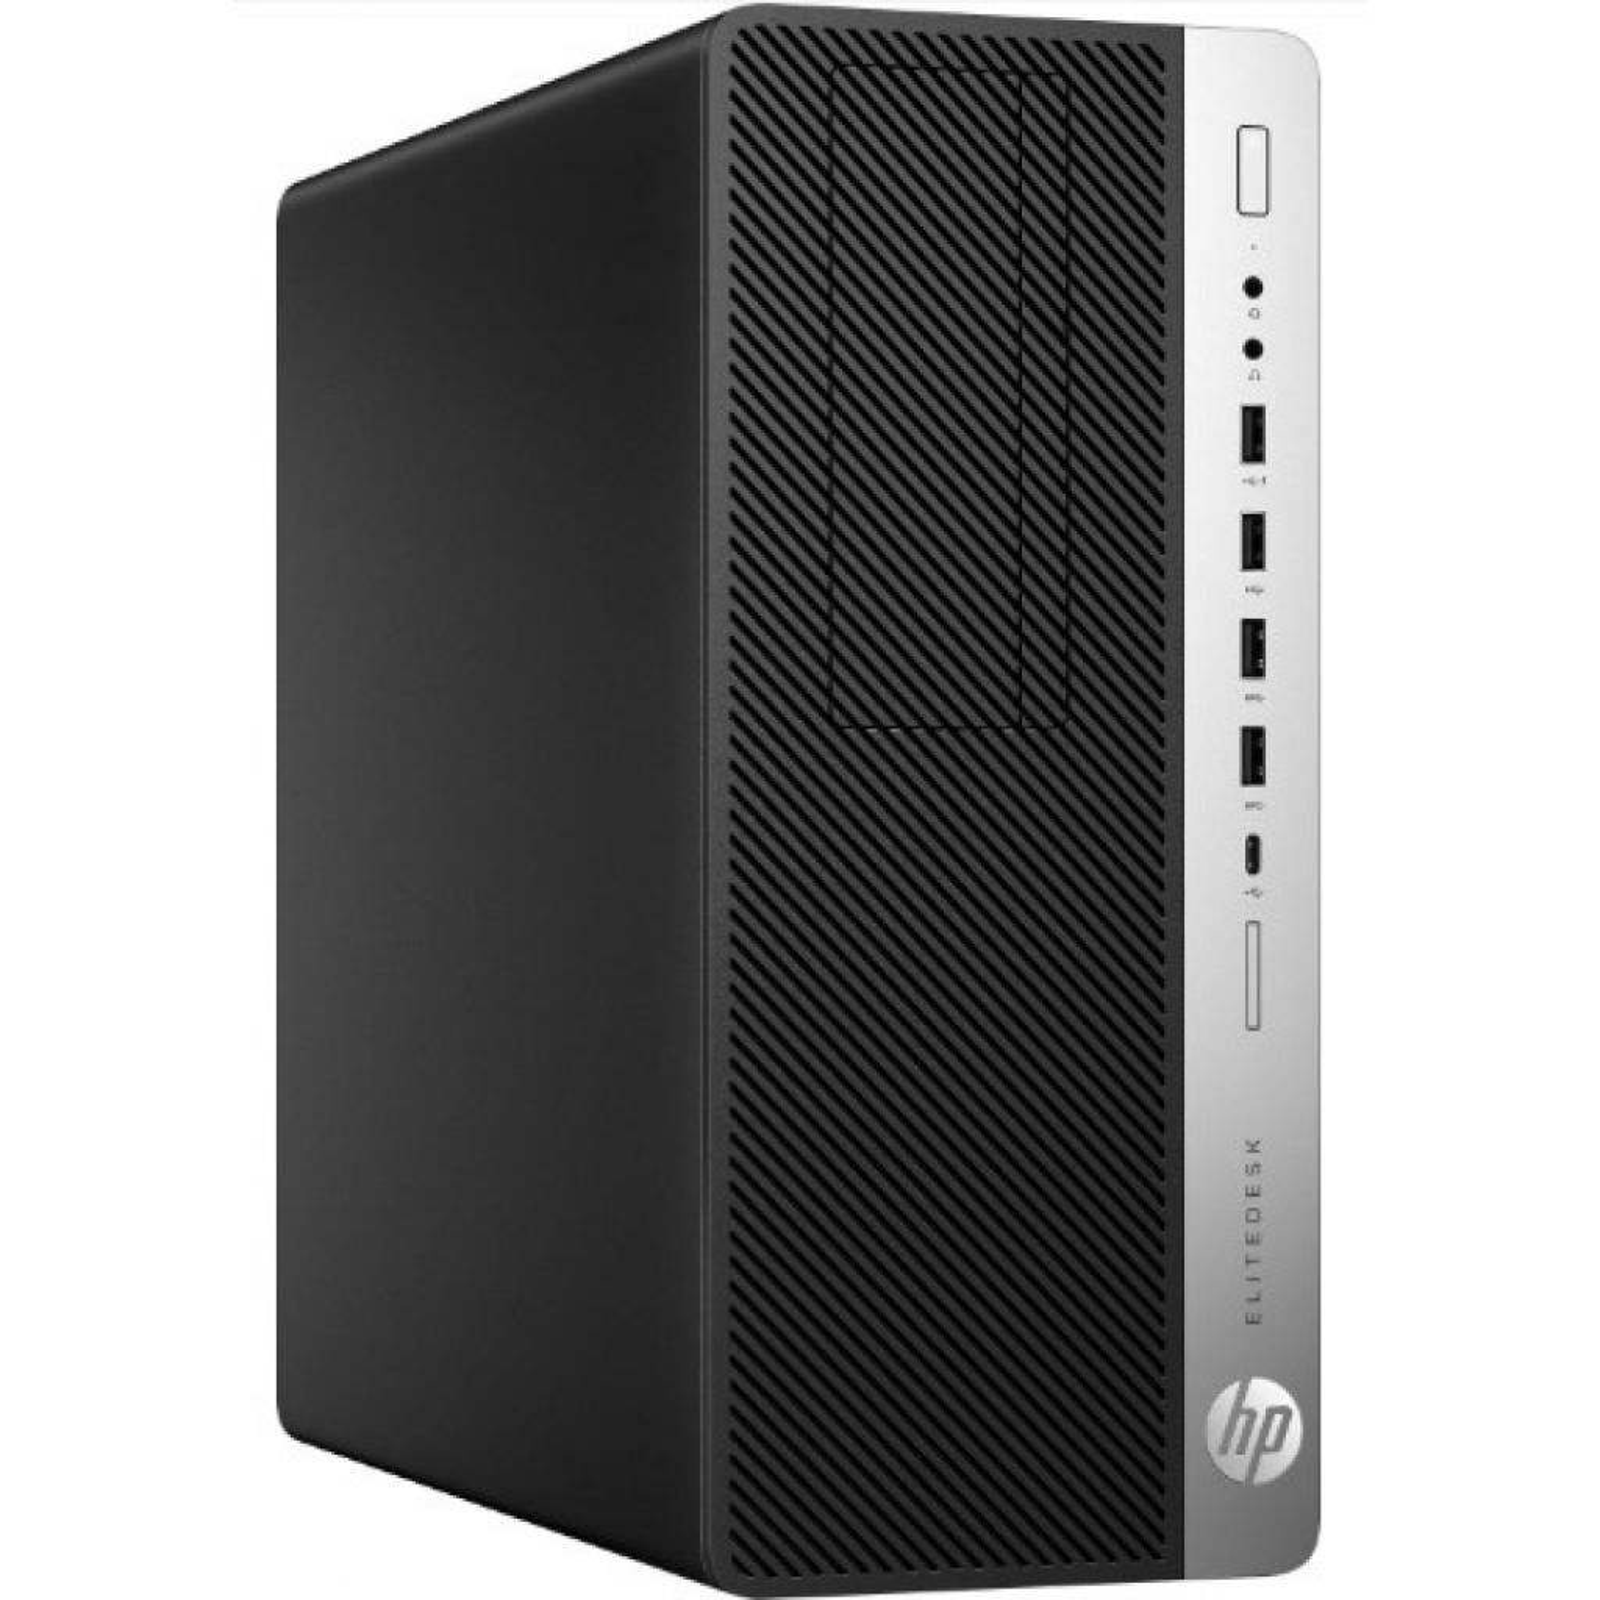 Компьютер HP EliteDesk 800 G5 TWR / i7-9700 (7QM90EA) изображение 2